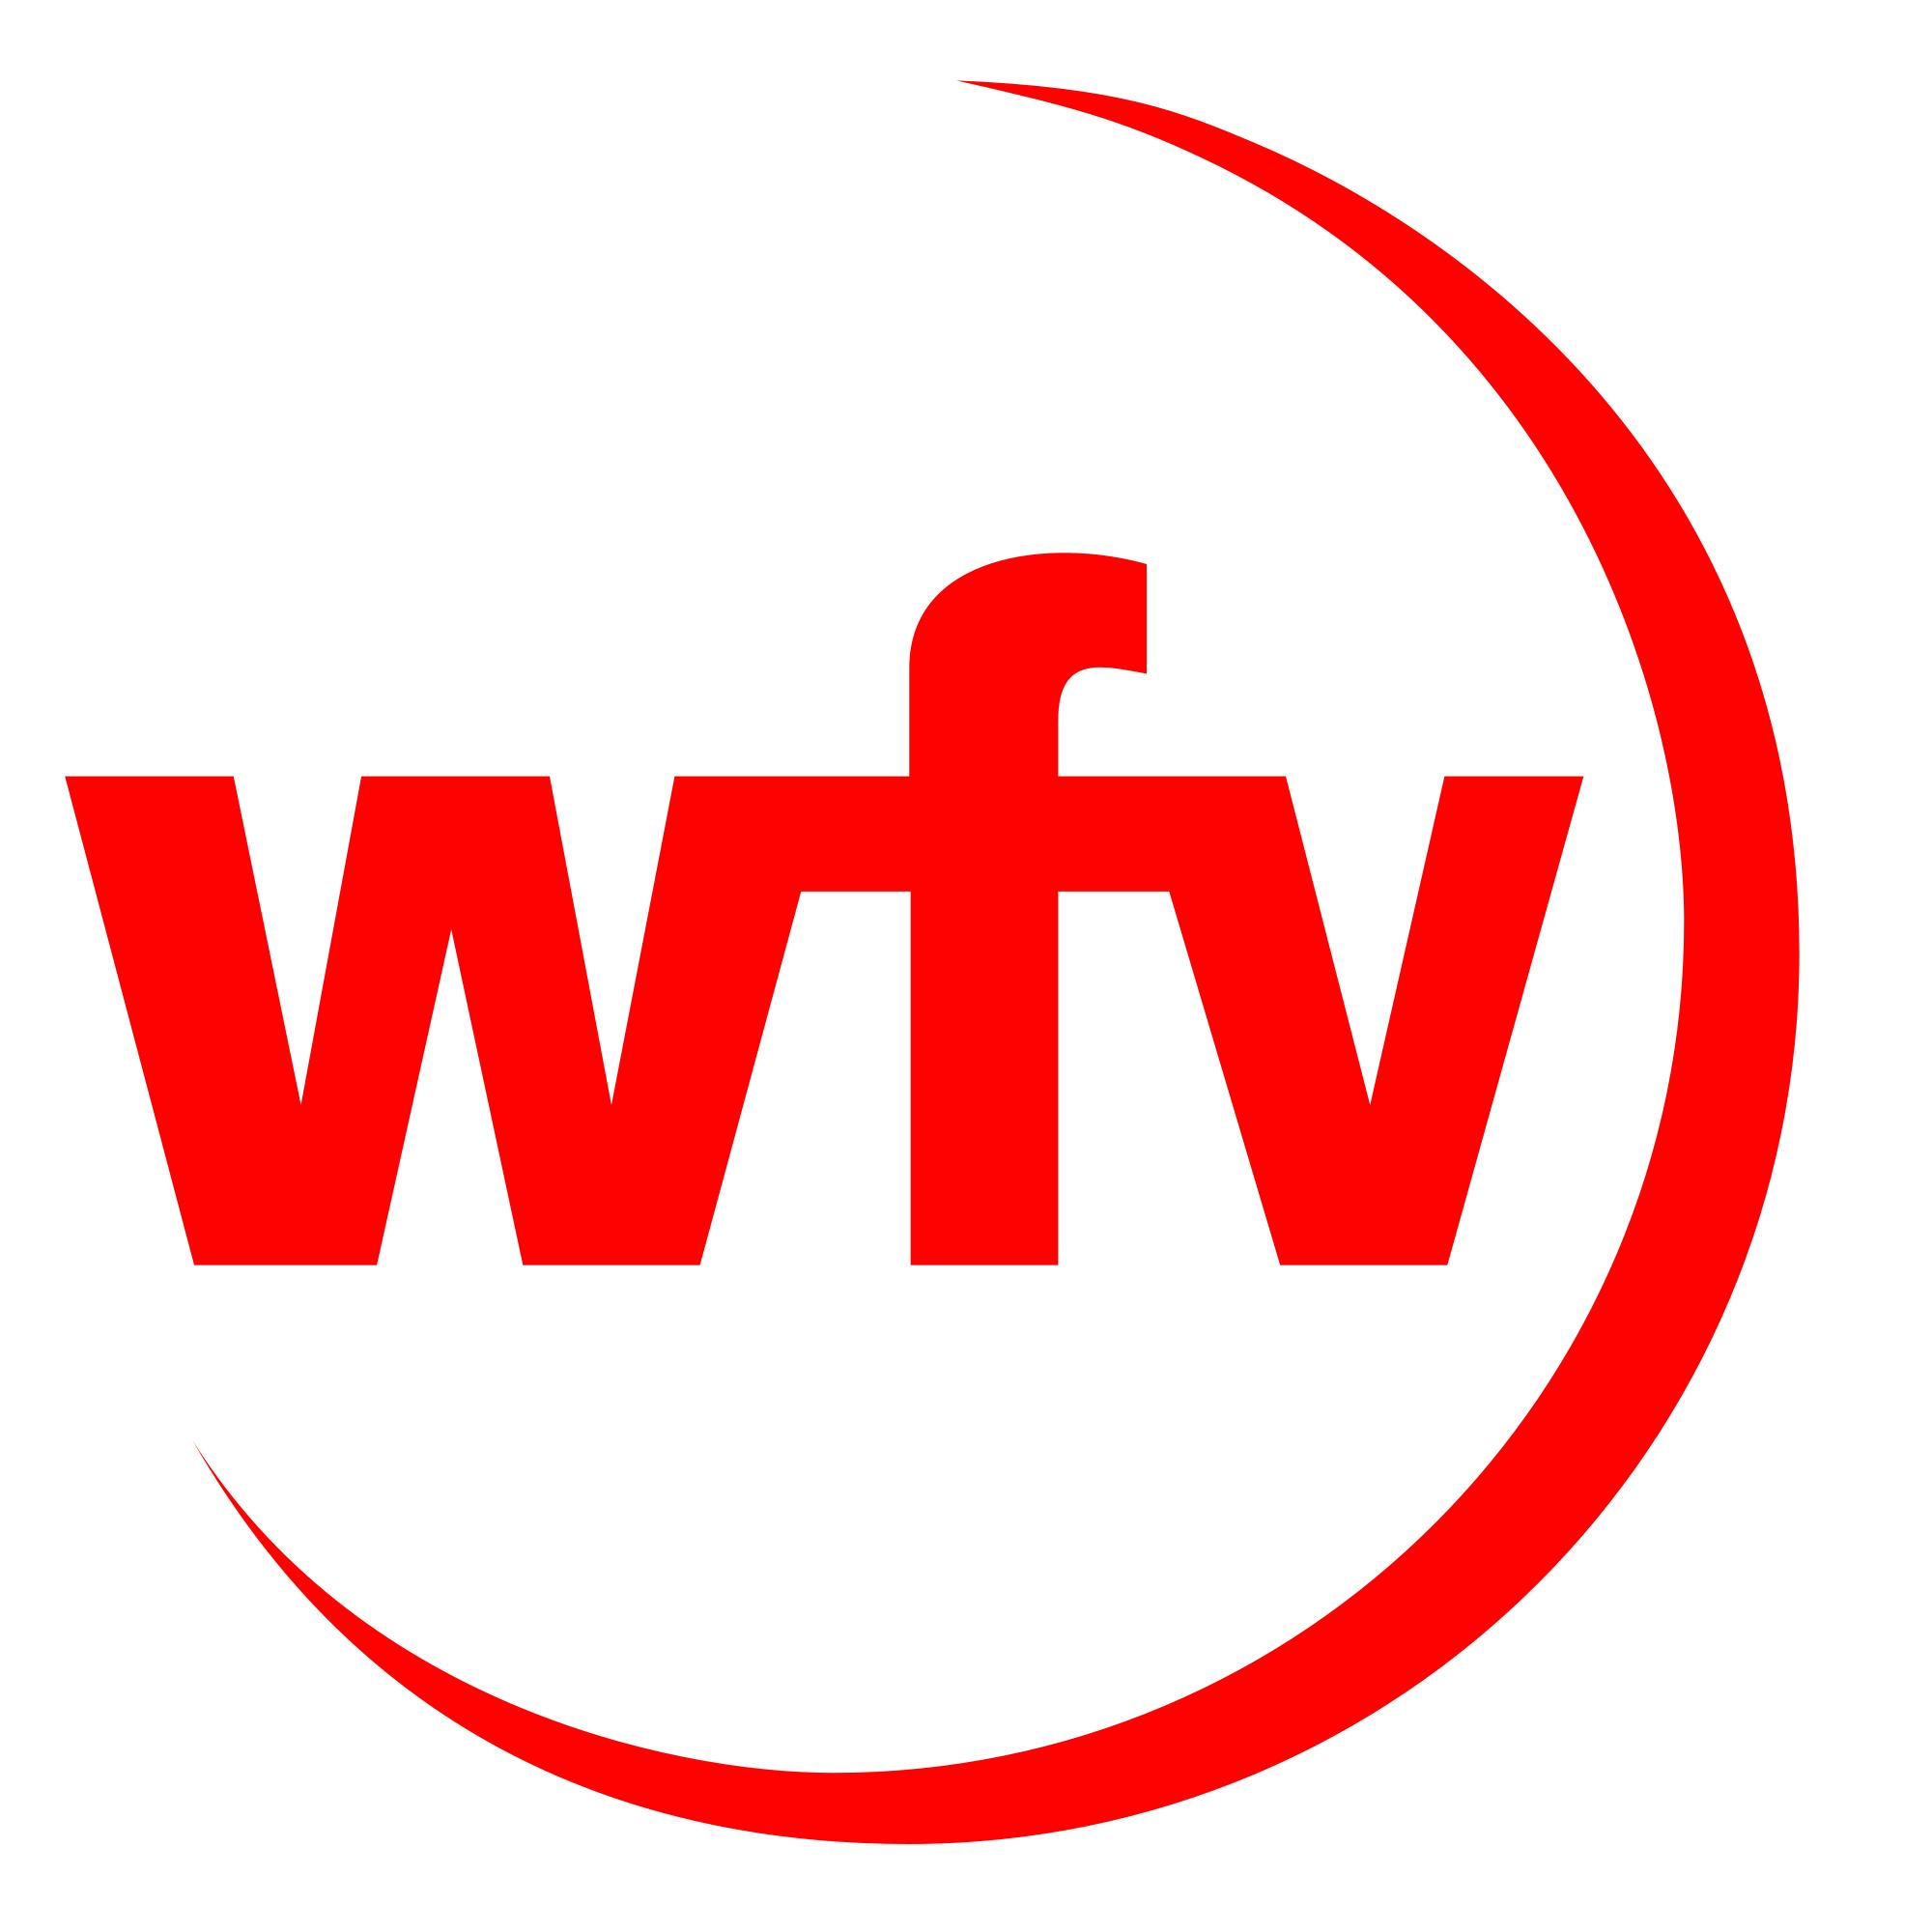 http://www.seifried-online.com/joomla/images/2000px-WFV-Logo1.jpg